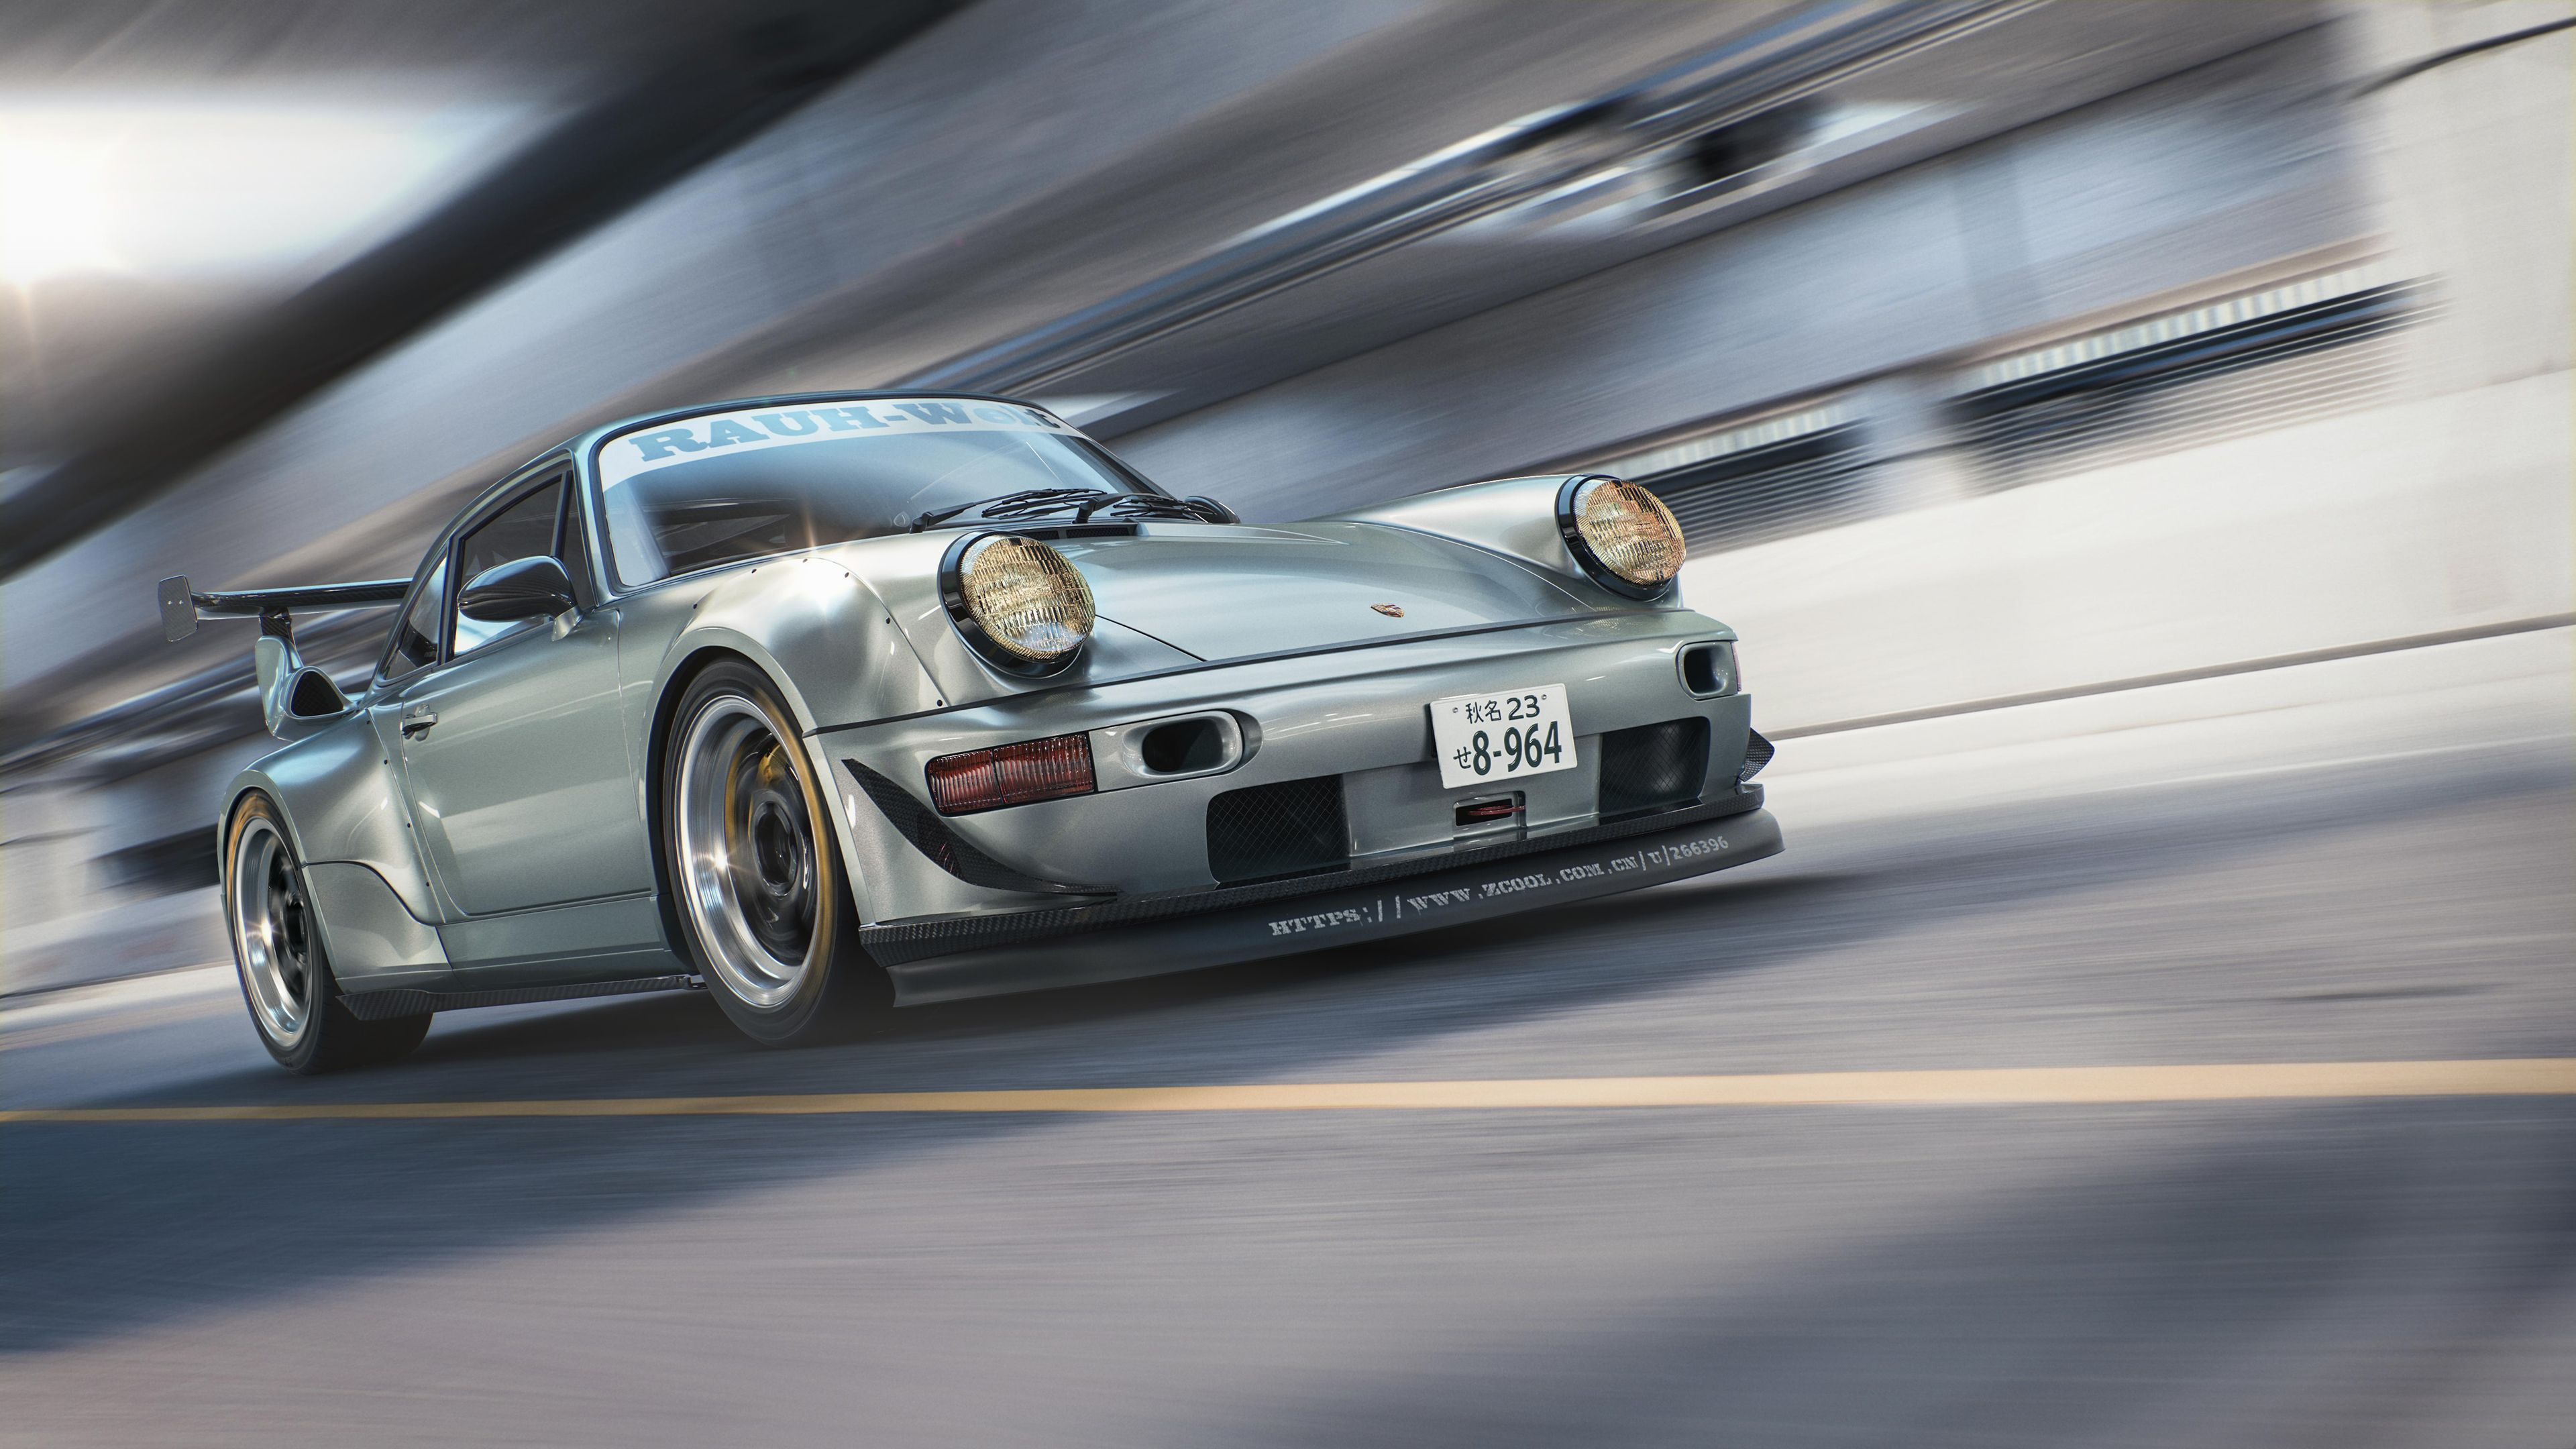 Porsche 964 RWB CGI 4k porsche wallpapers hd wallpapers cgi 3840x2160